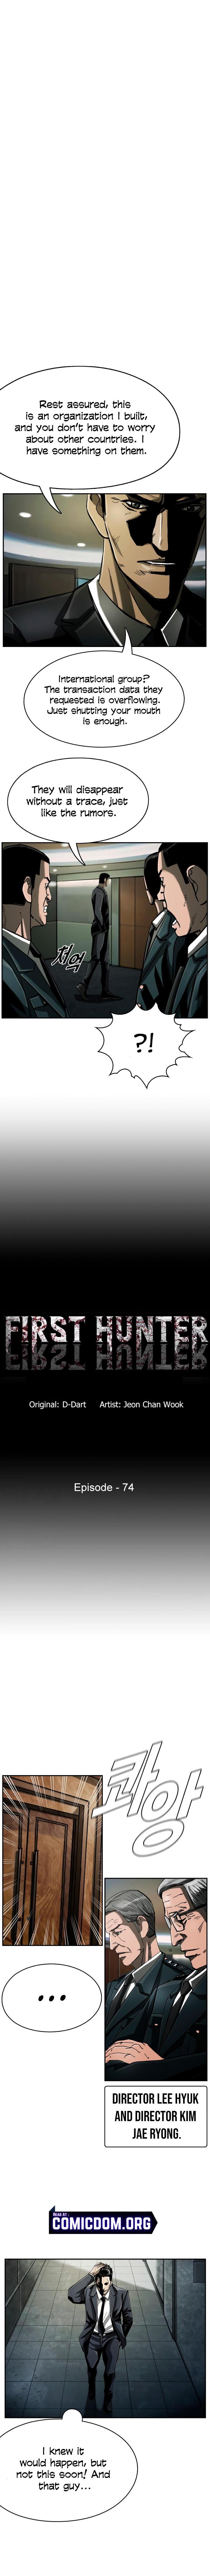 The First Hunter Chapter 74 page 4 - Mangakakalots.com